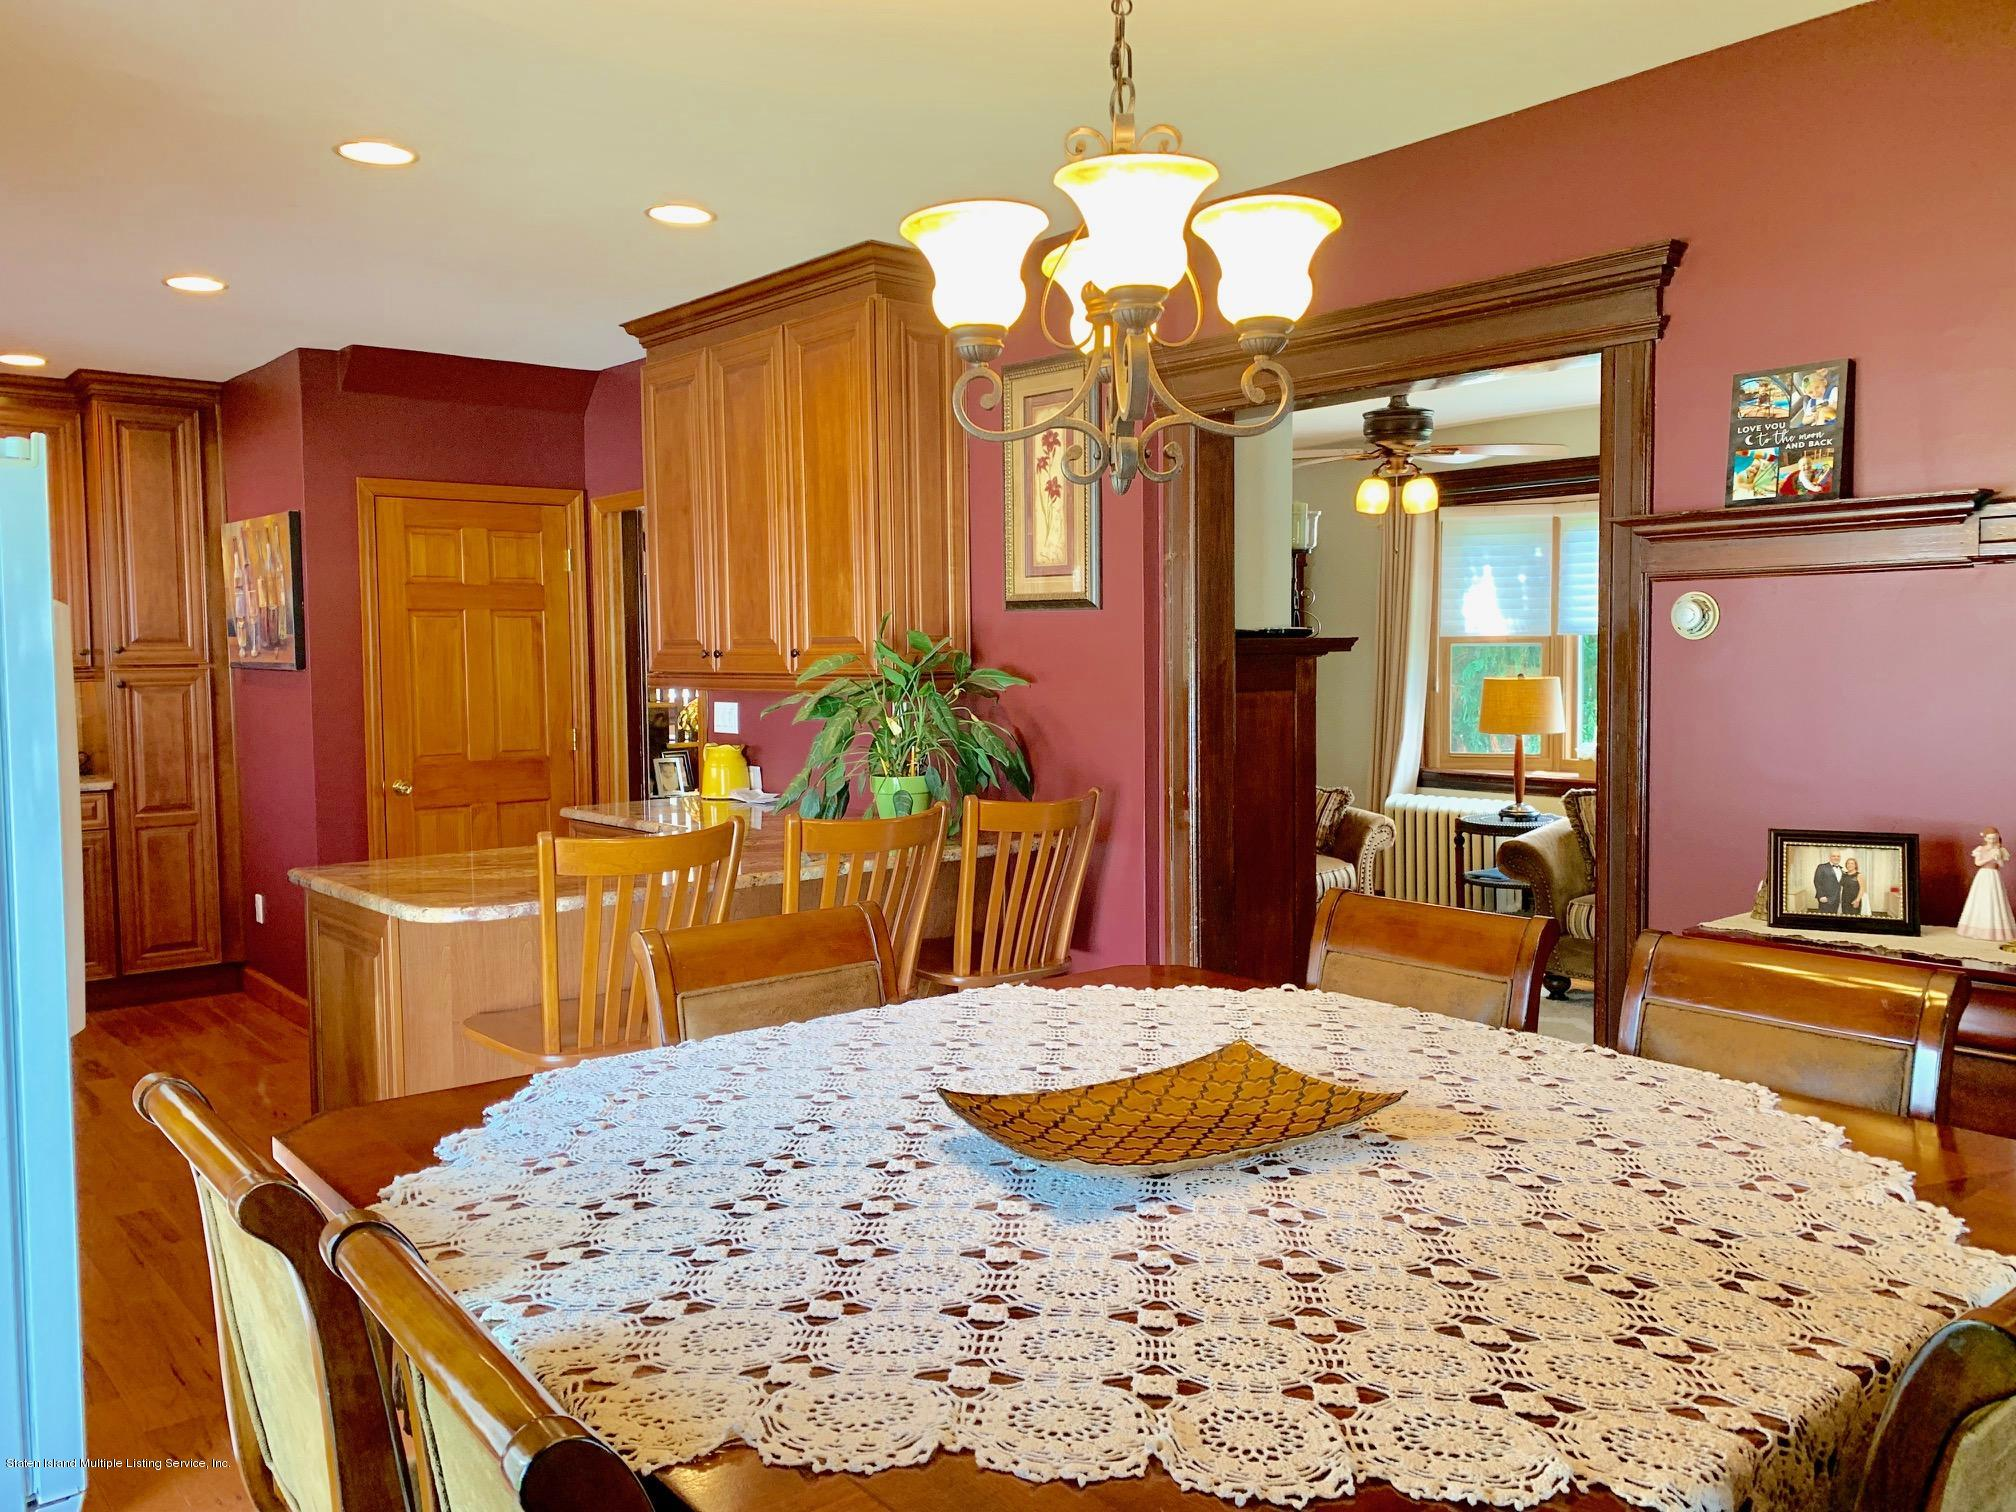 Single Family - Detached 195 Fairview Avenue  Staten Island, NY 10314, MLS-1132423-17